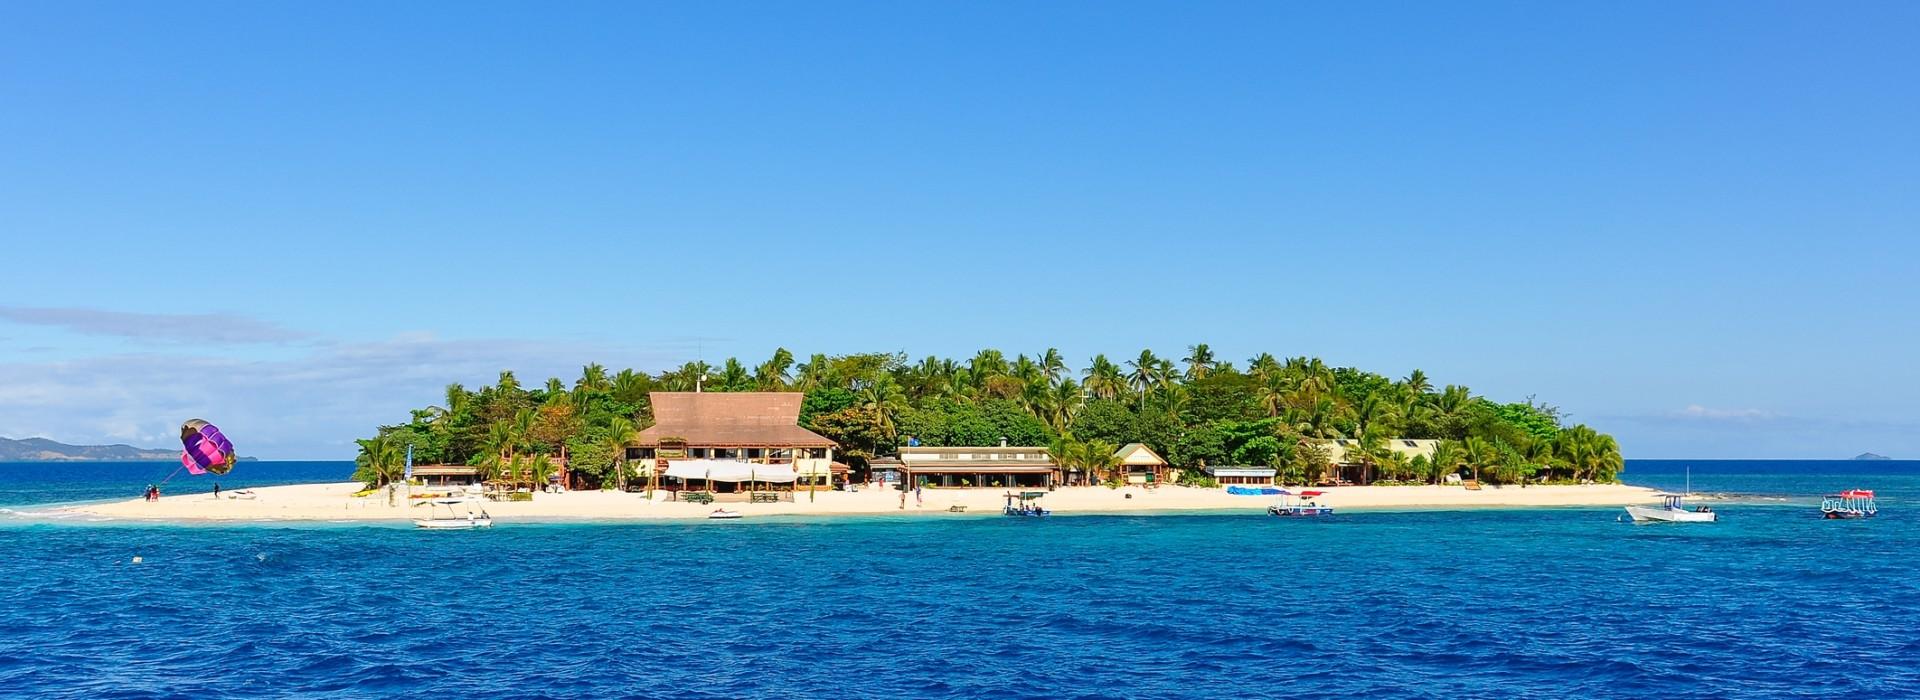 Fiji Tours and Trips to Fiji